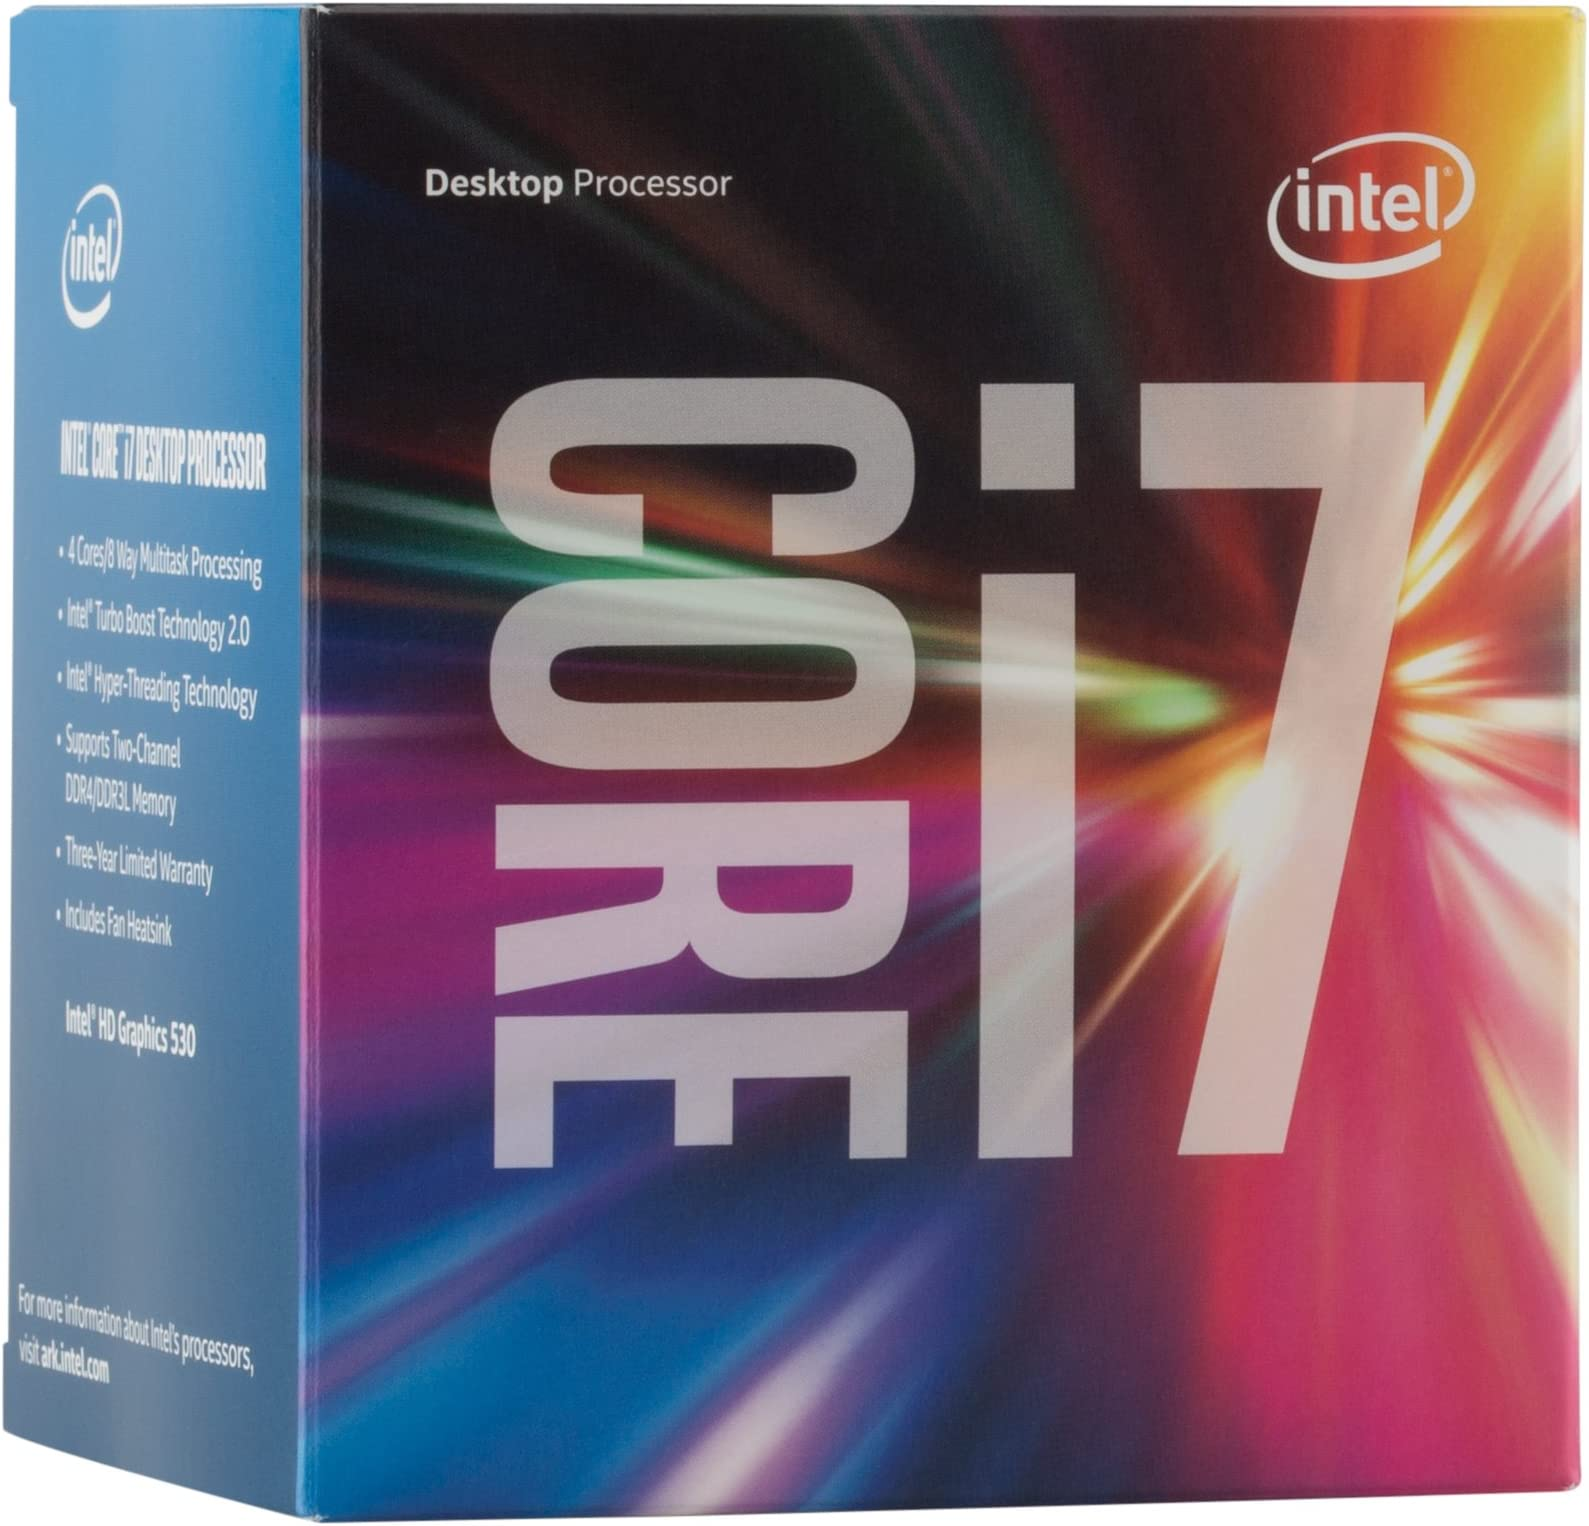 Intel Boxed Core I7-6700 FC-LGA14C 3.40 GHz 8 M Processor Cache 4 LGA 1151 BX80662I76700